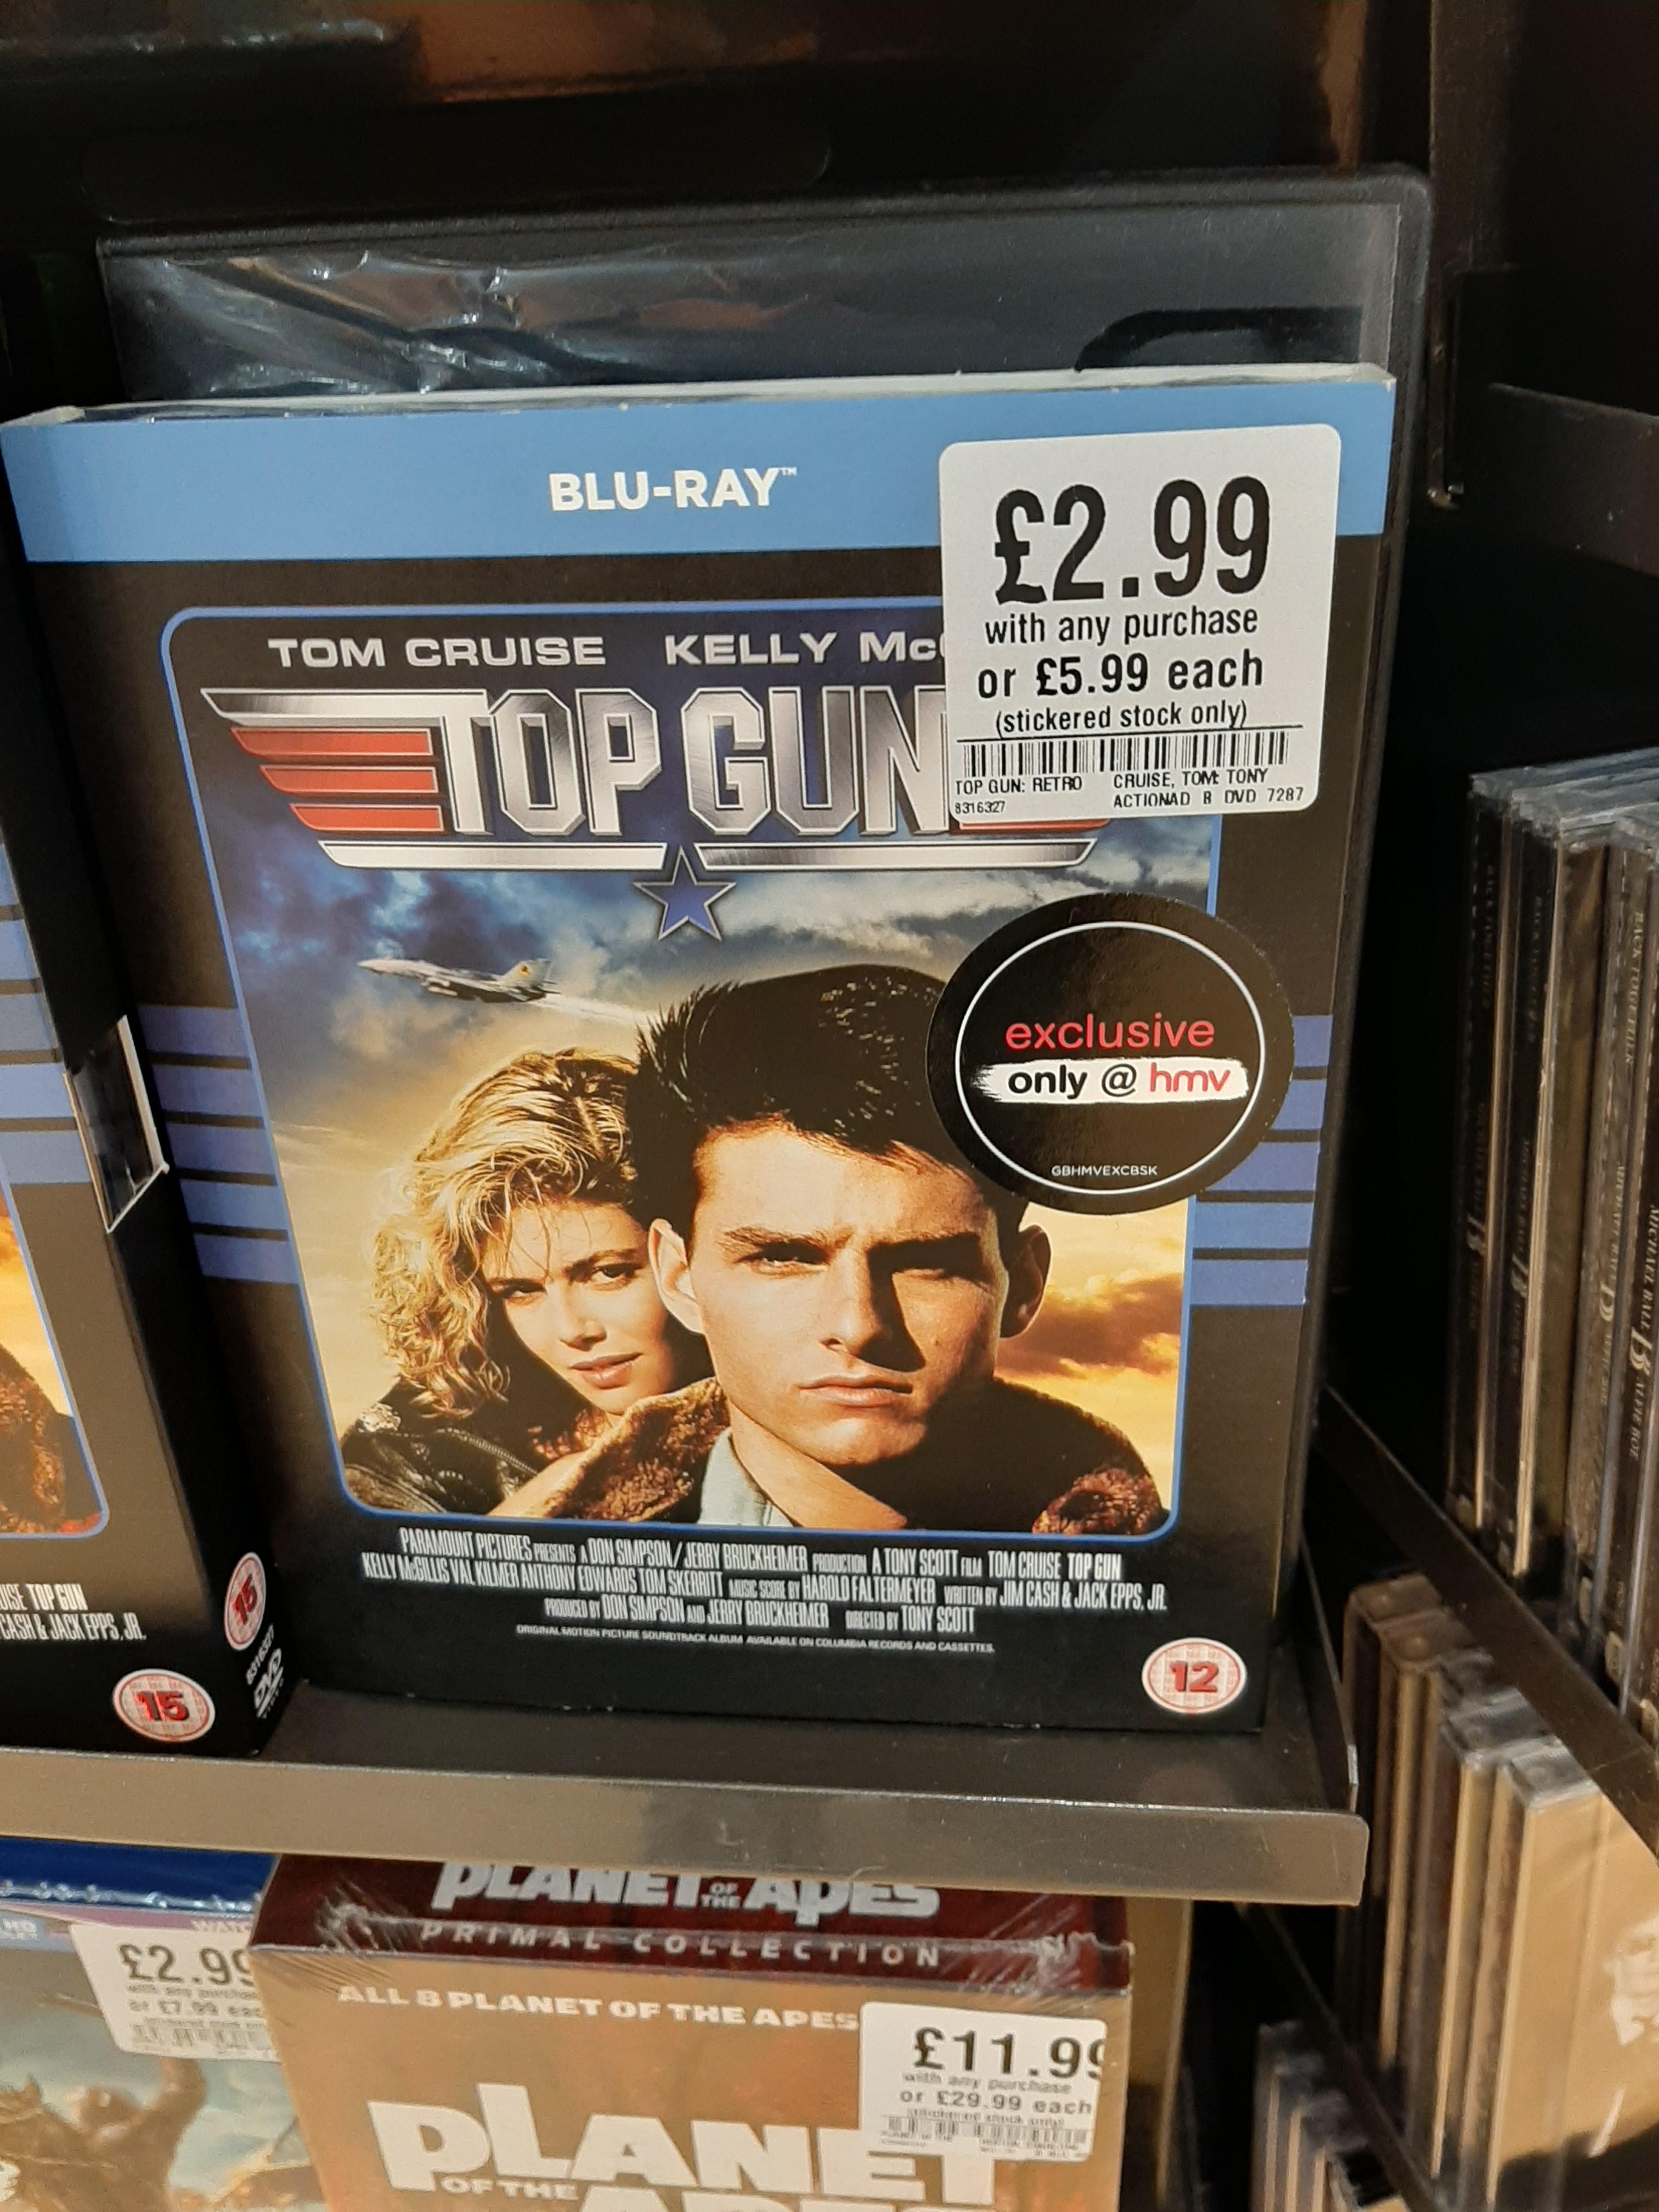 Top Gun Blu-ray £2.99 with any purchase @ HMV (instore) Harrogate